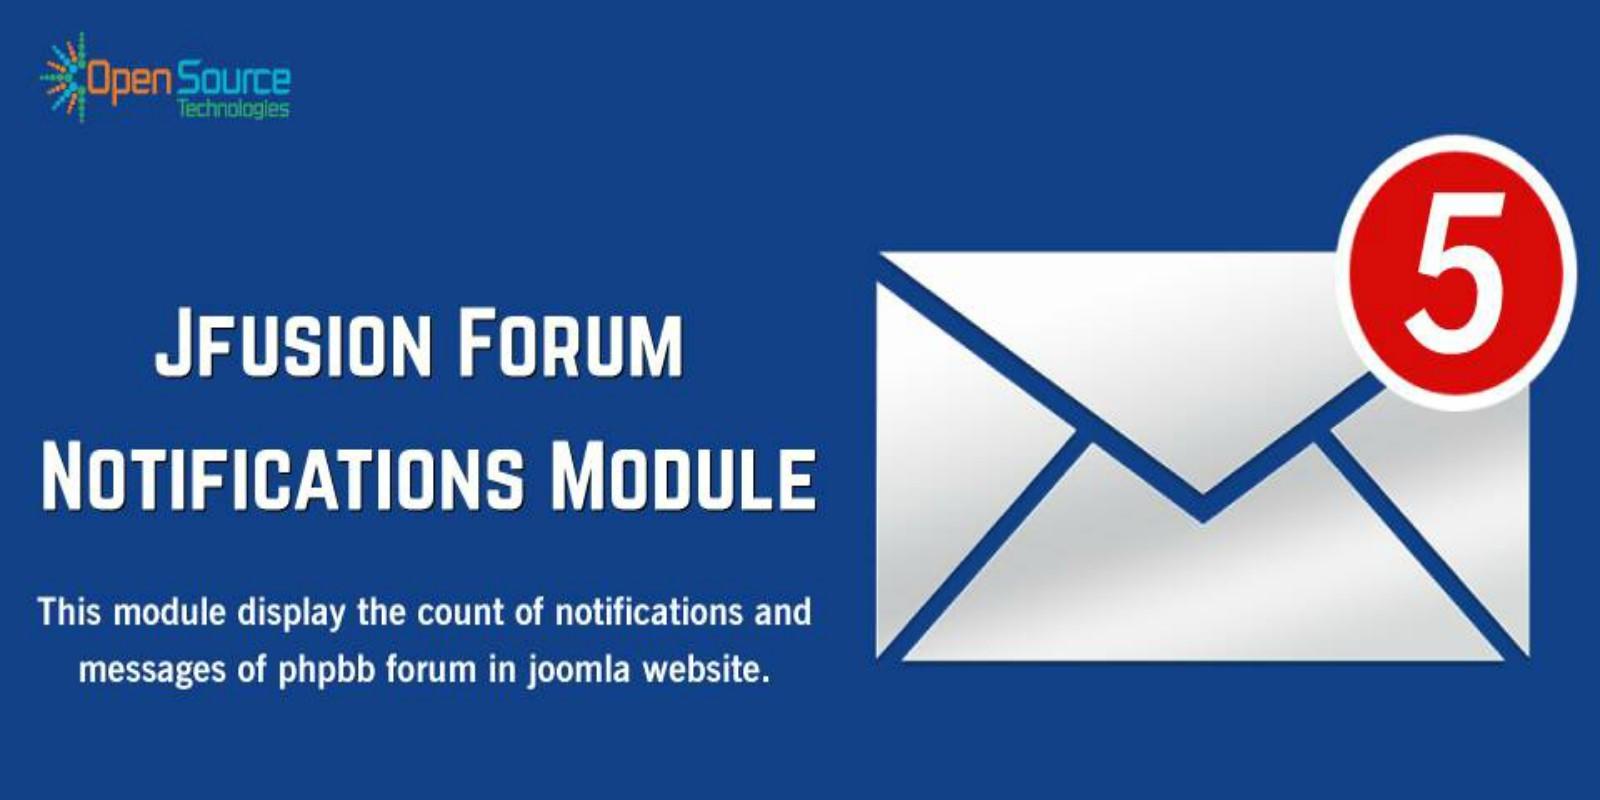 Jfusion Forum Notifications Message Module